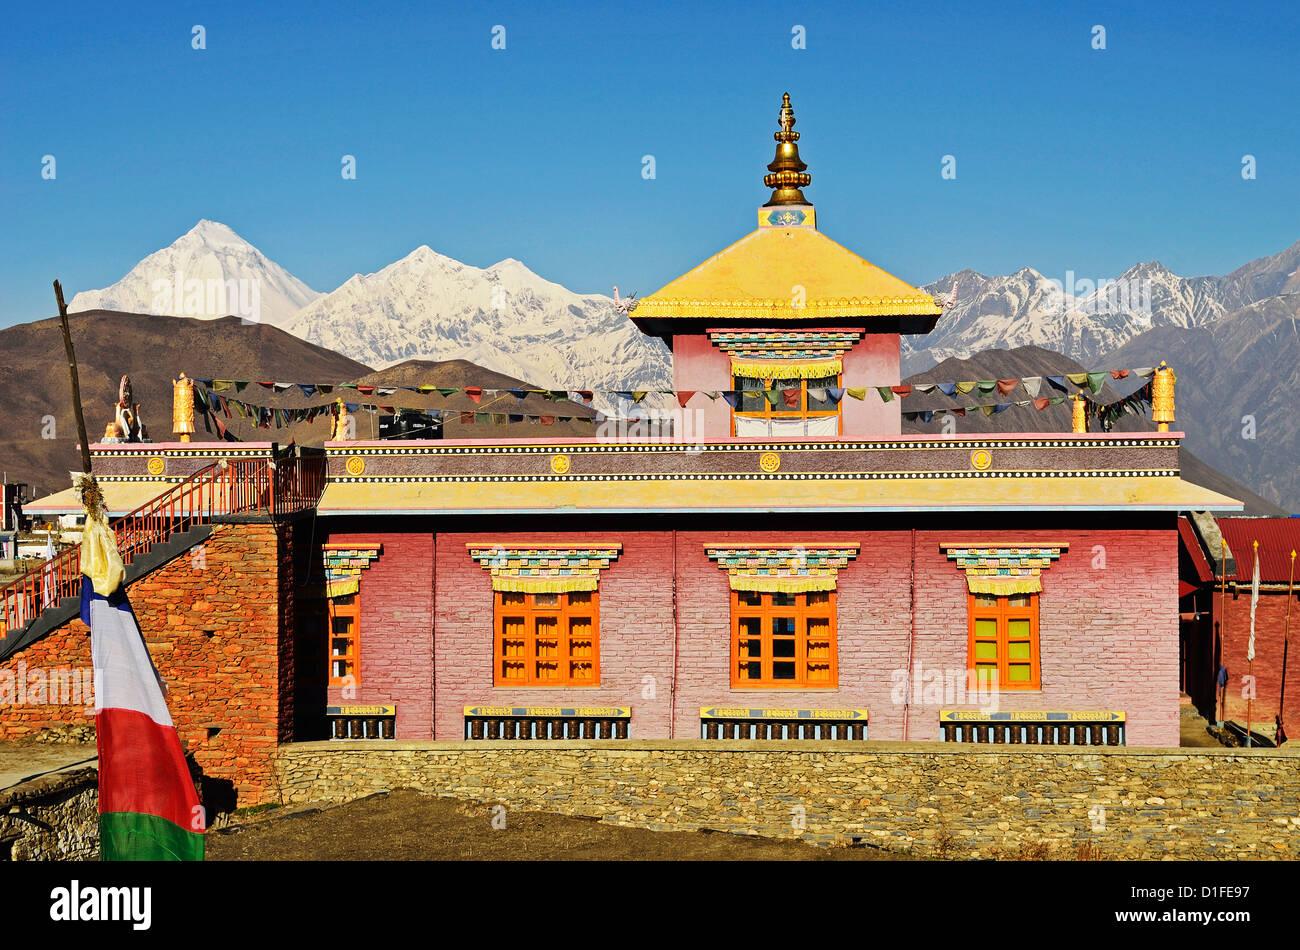 Muktinath and Dhaulagiri Himal, Annapurna Conservation Area, Dhawalagiri (Dhaulagiri), Western Region (Pashchimanchal), - Stock Image